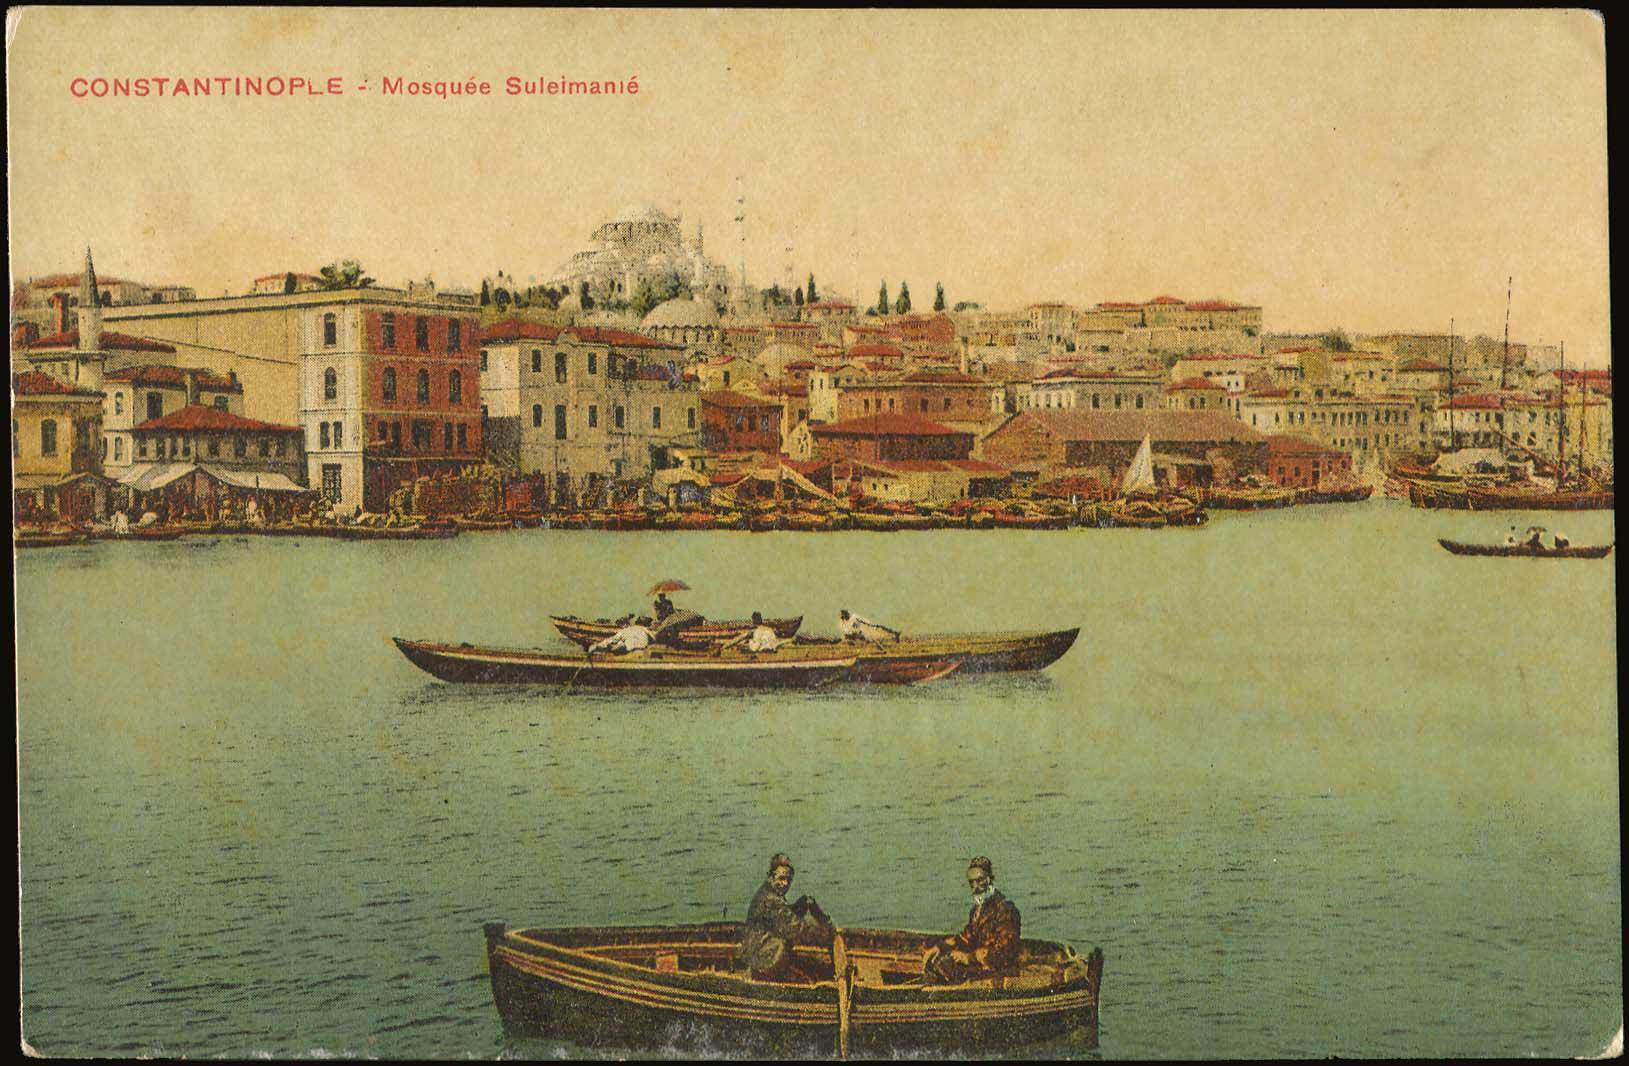 Lot 1558 - picture postcards SMYRNE, CONSTANTINOPLE, ASIA MINOR -  A. Karamitsos Postal & Live Internet Auction 680 General Philatelic Auction